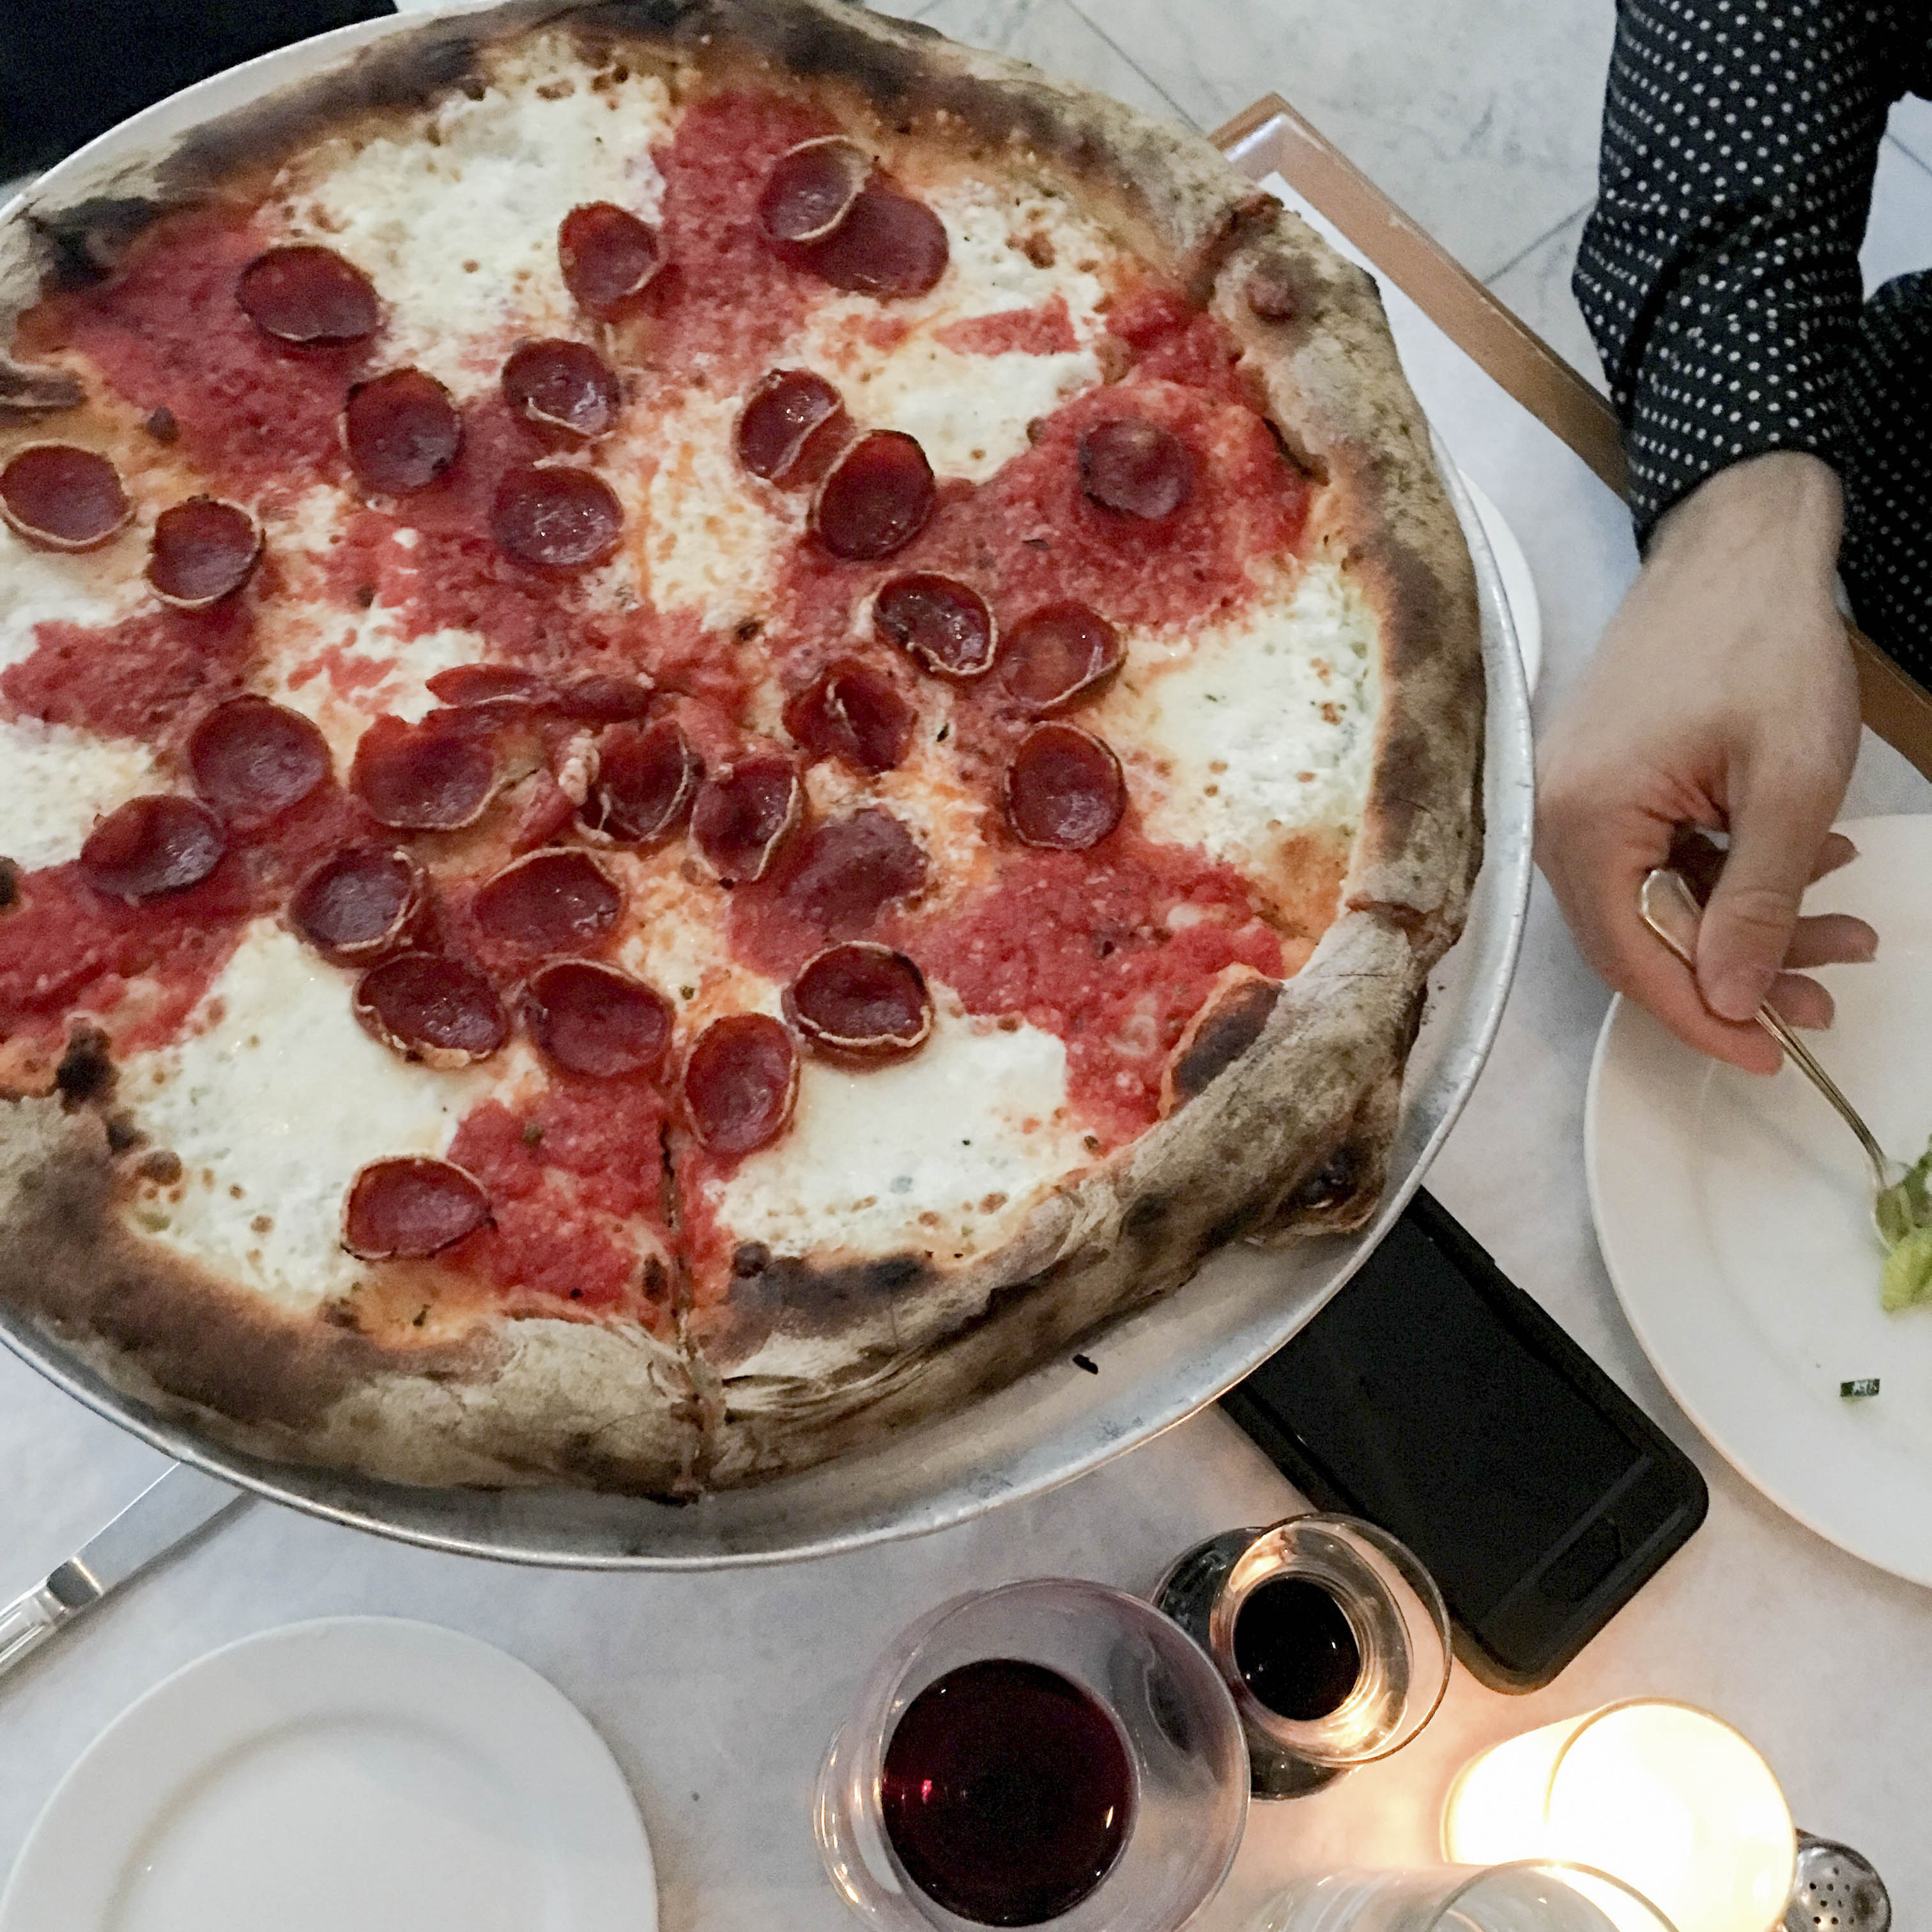 Bottega Louie Pepperoni Pizza: Mozzarella, Pecorino Romano, Pepperoni, Tomato Sauce & Oregano